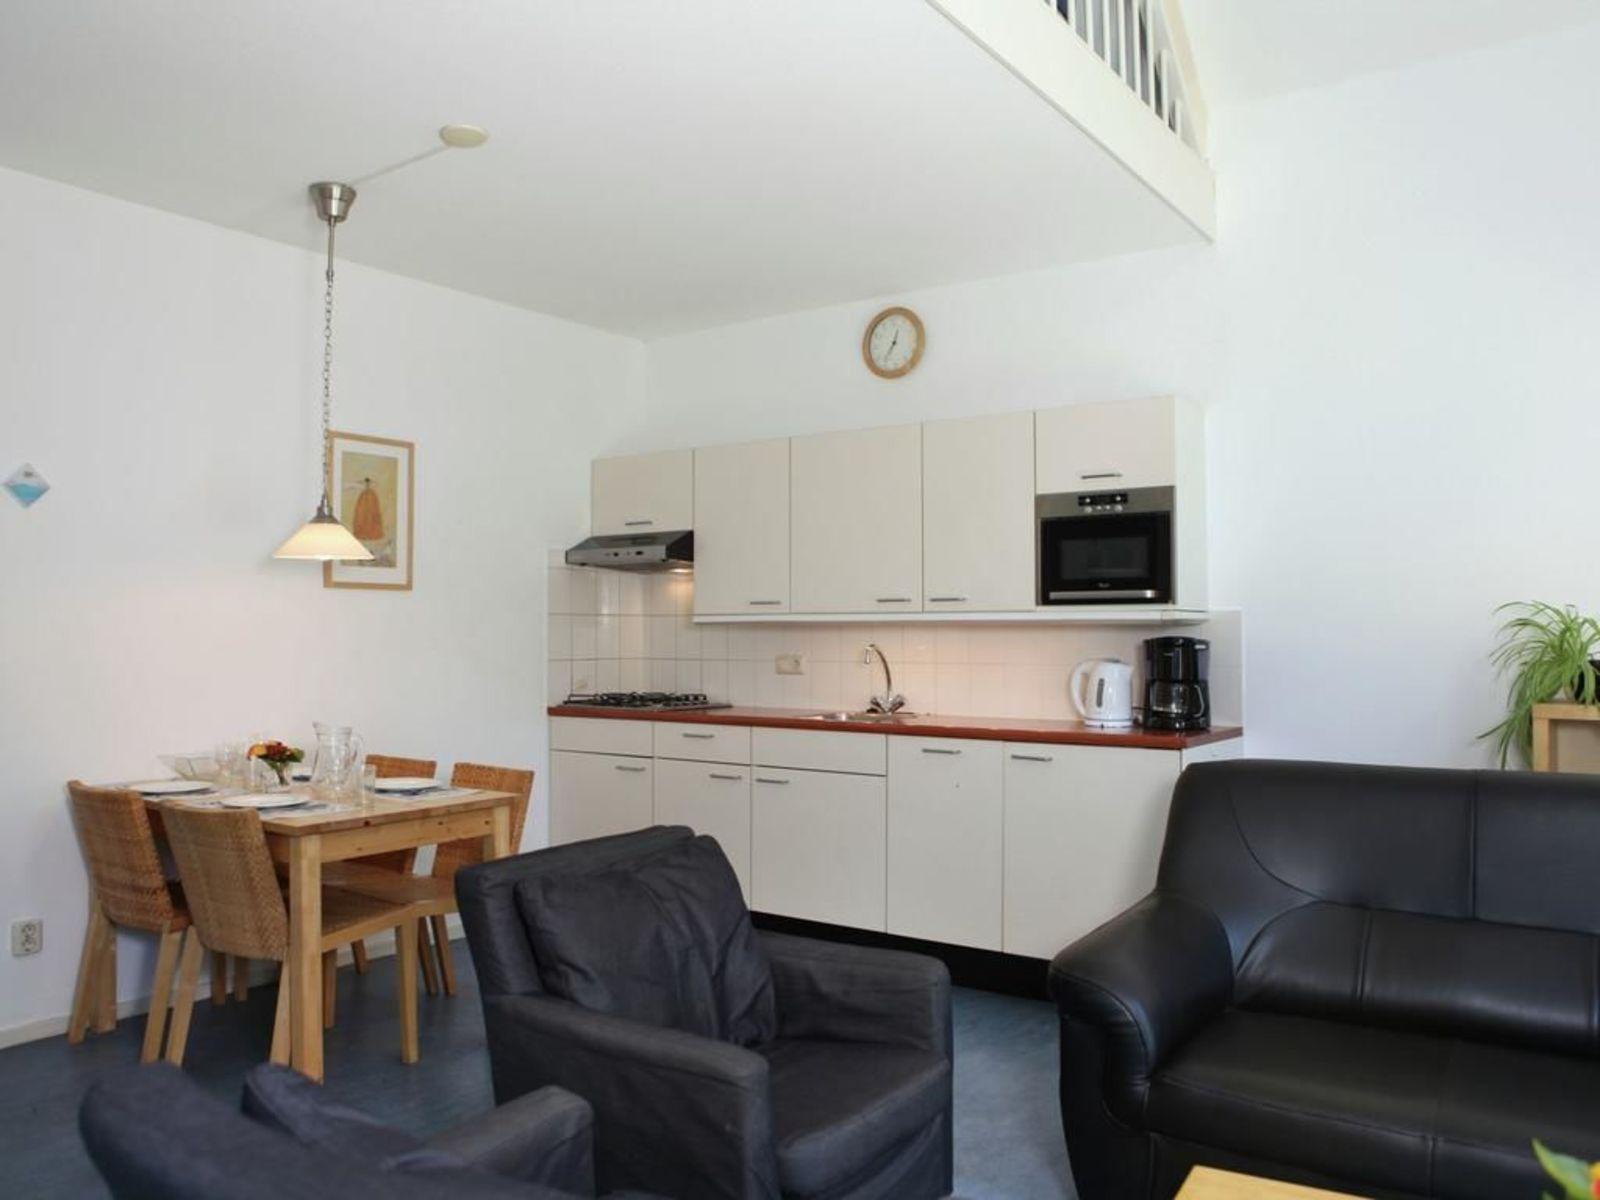 Vide Appartement